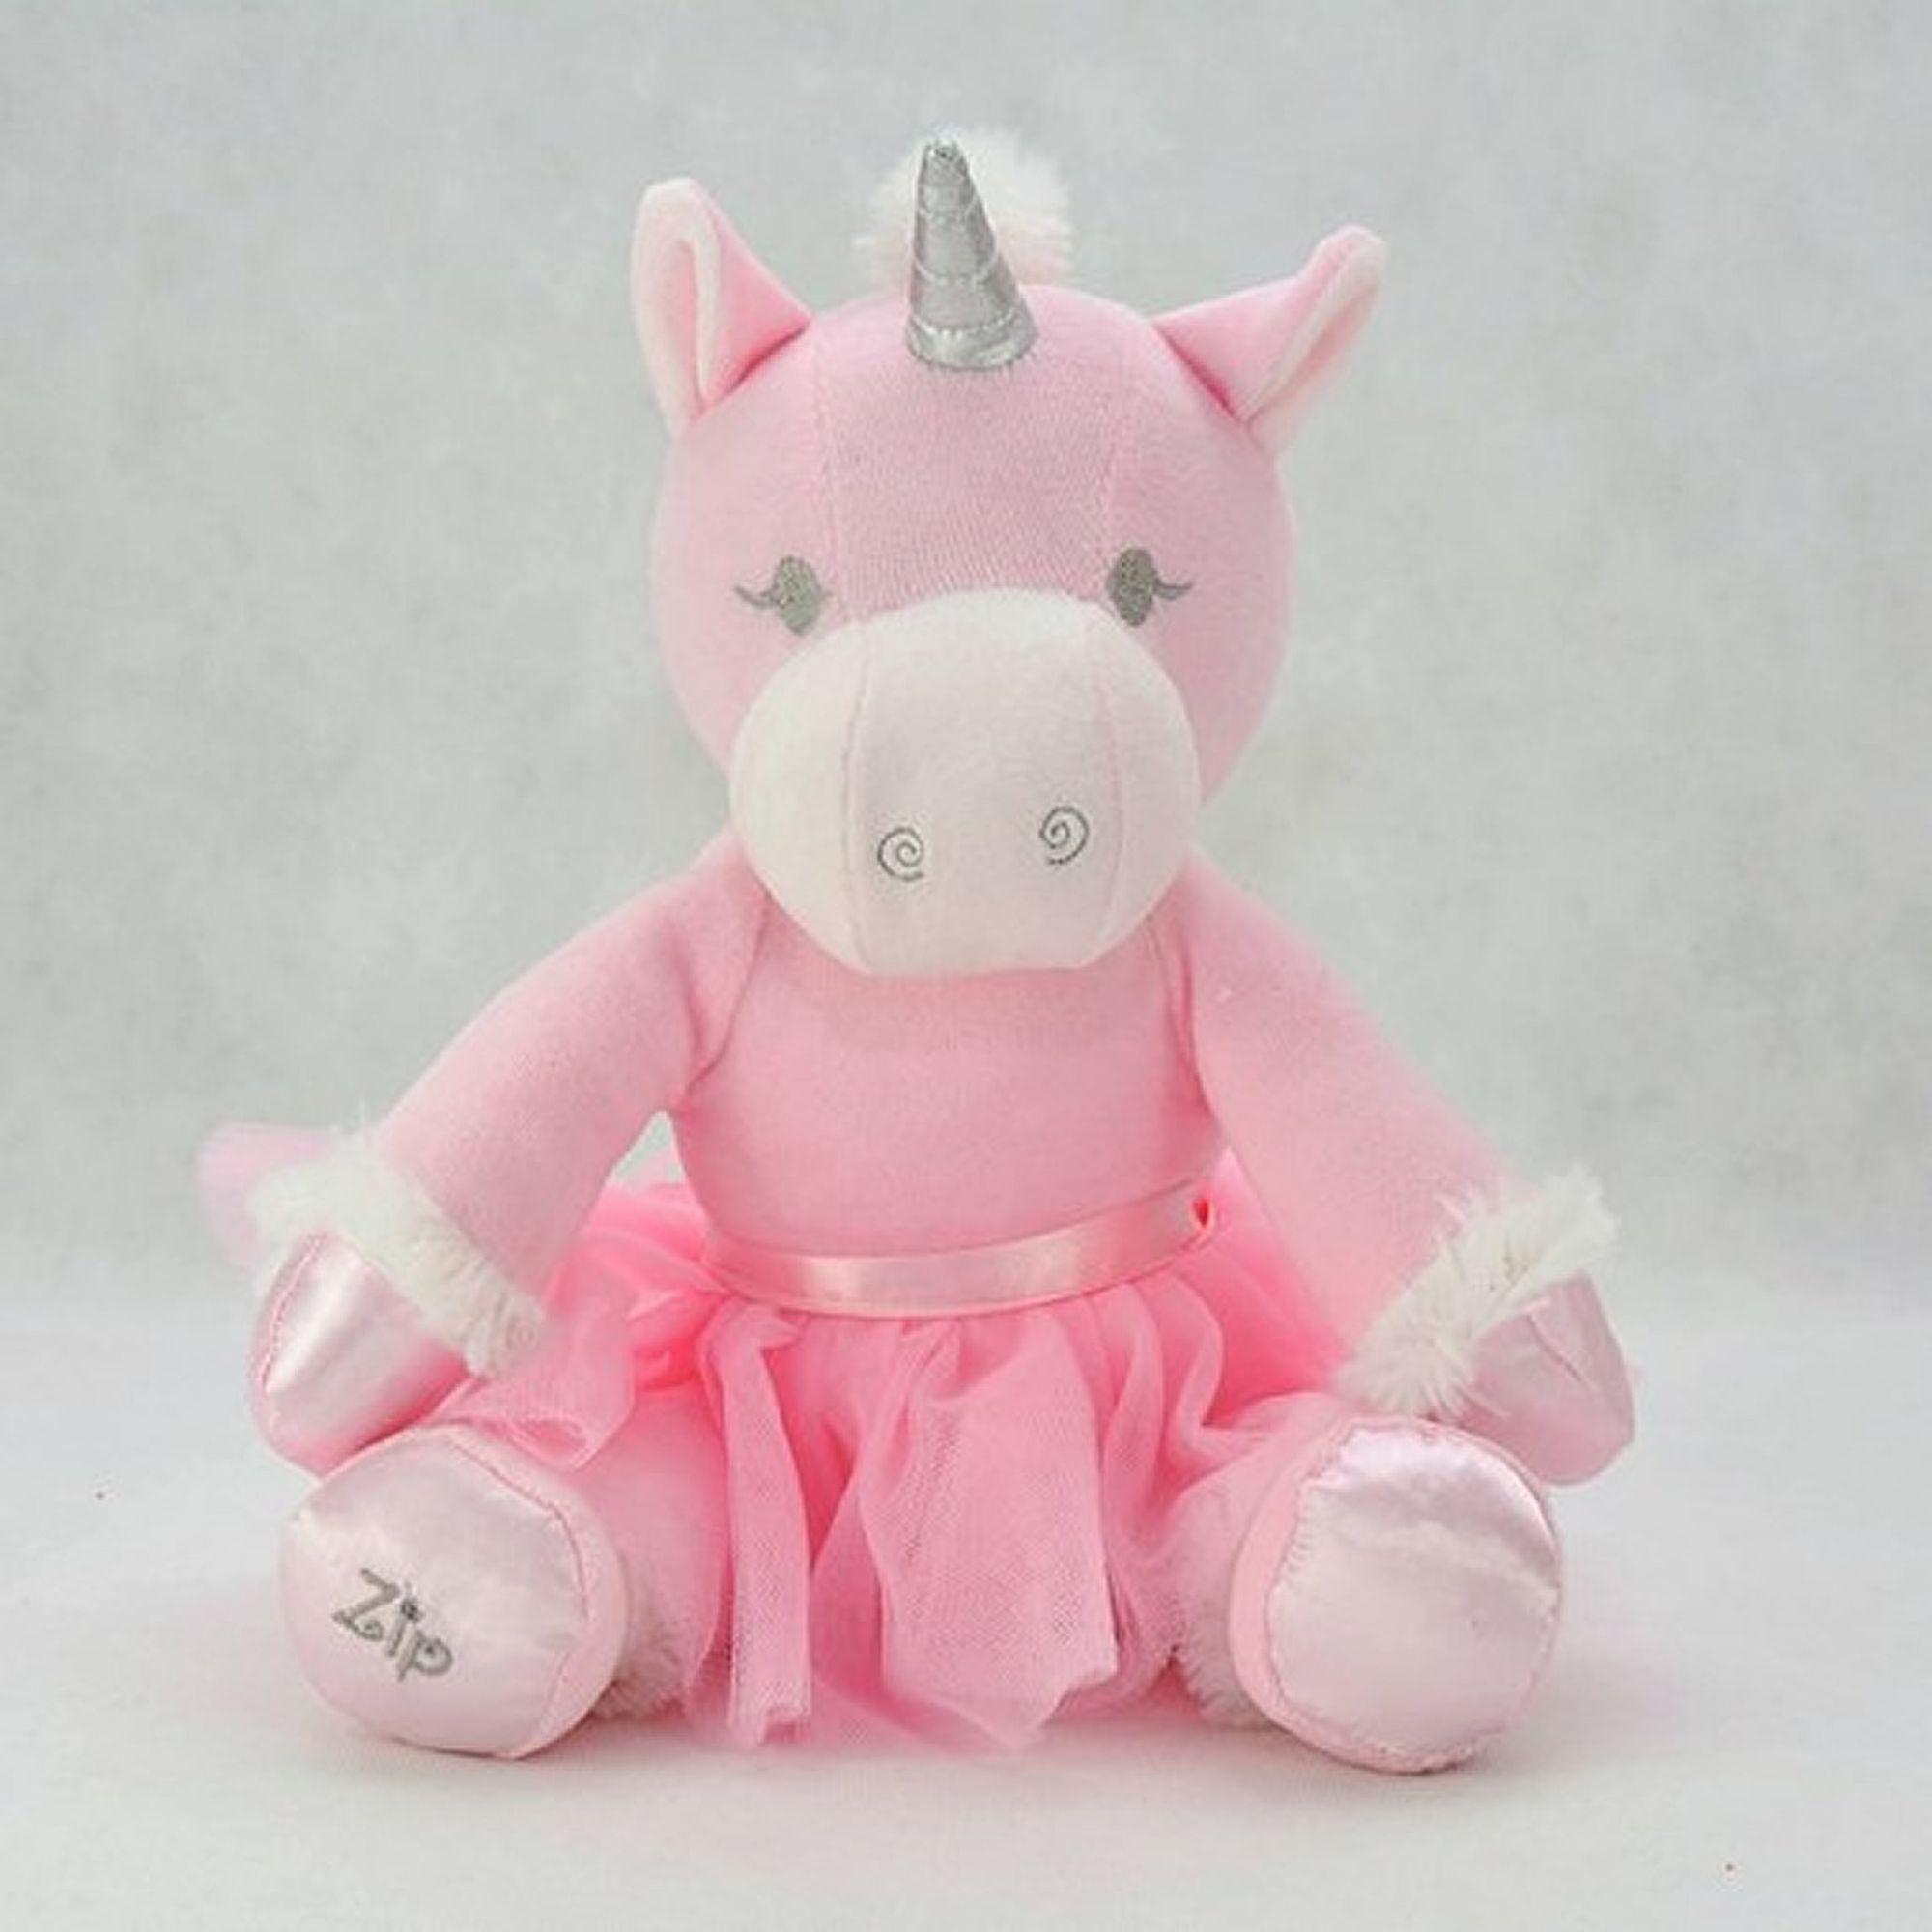 bichinho-pelucia-unicornio-bailarina-rosa-ziptoys